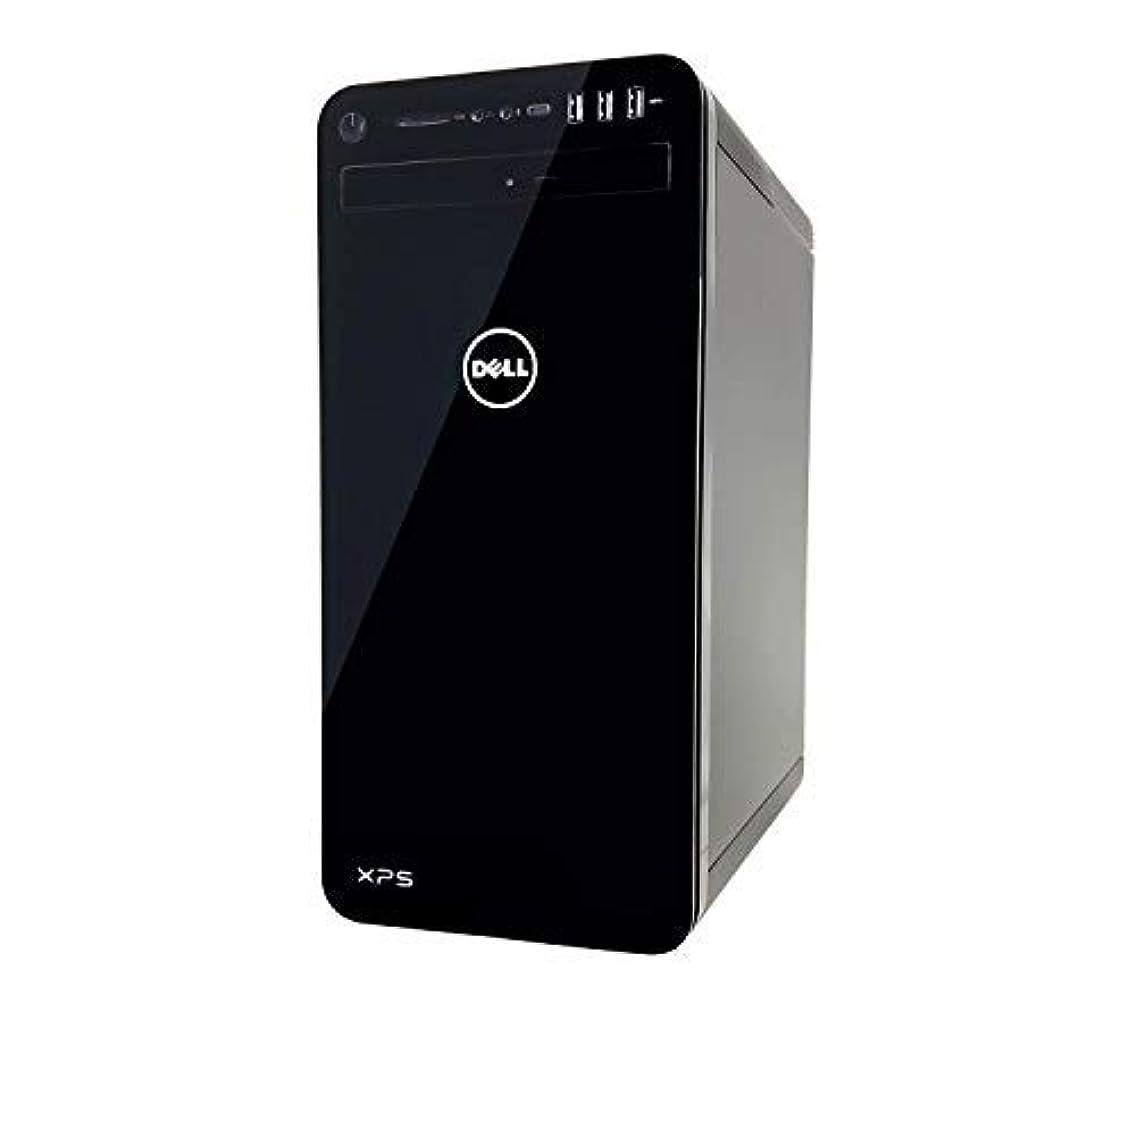 Dell XPS8930-7132BLK-PUS XPS 8930 Desktop PC, Intel Core i7-8700 3.2 GHz 6-Core Processor, 24GB DDR4 SDRAM,16GB Intel Optane Memory, 1TB Hard Drive, Windows 10 Home